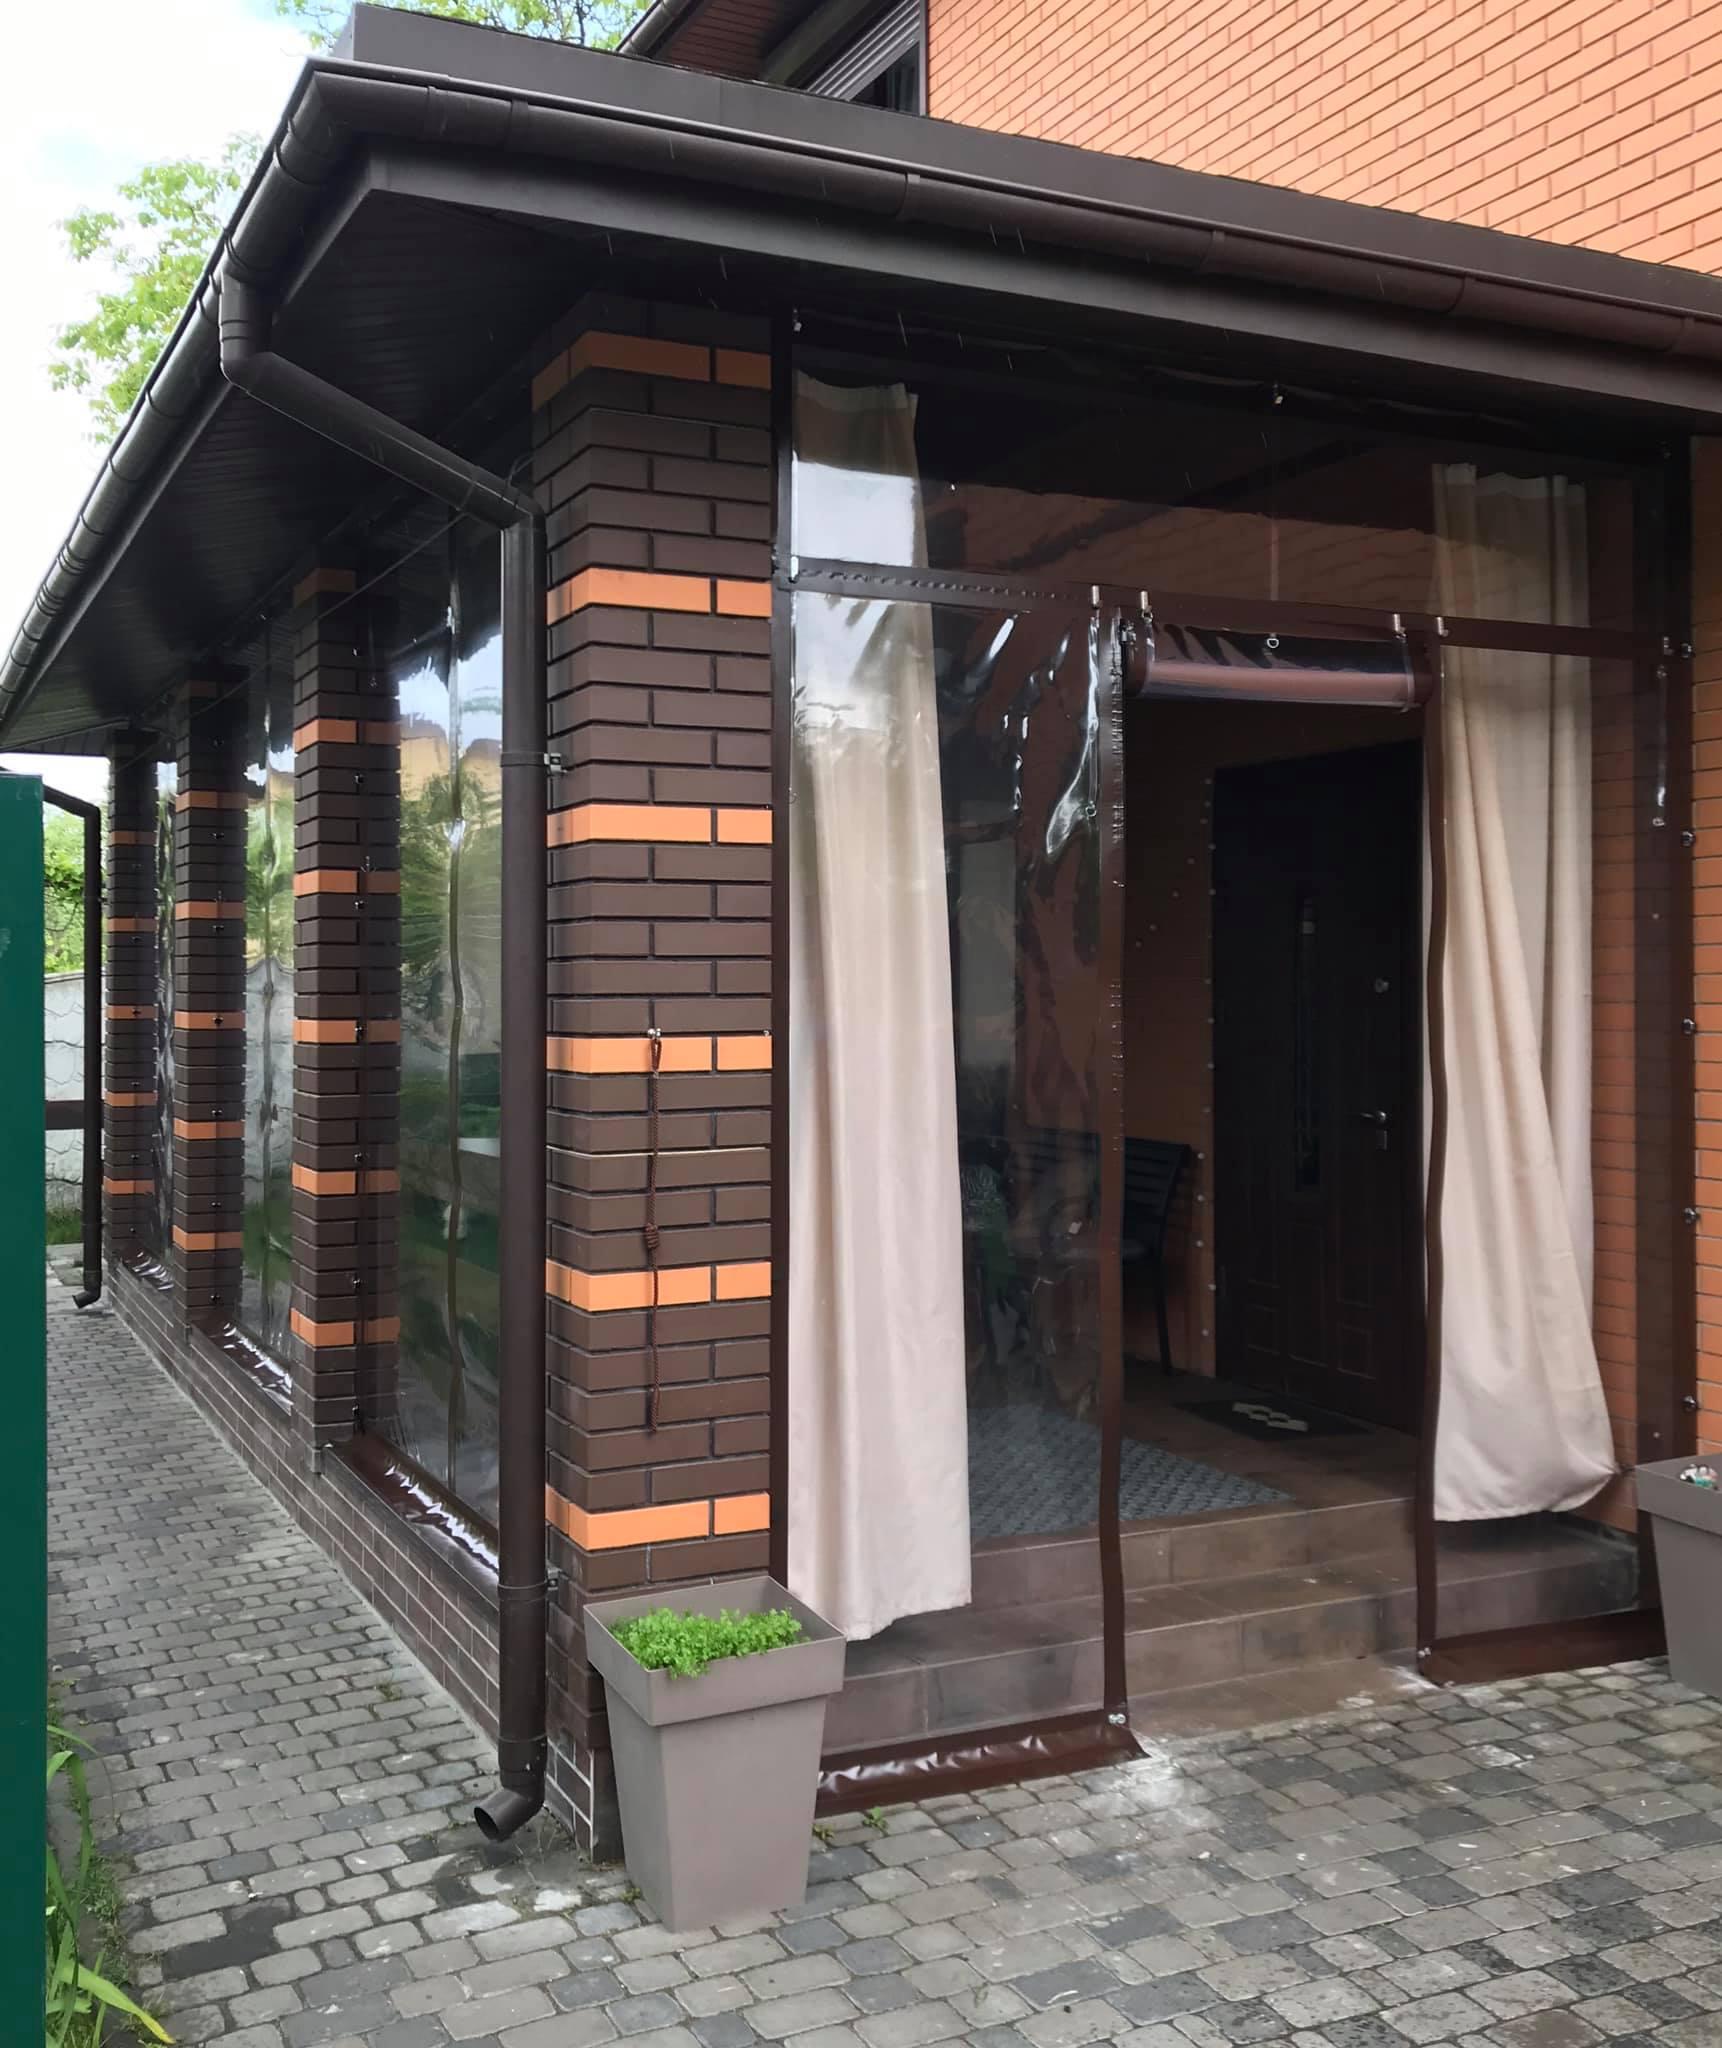 Мягкие двери на кирпичную веранду в Киеве (Славутич дачи)